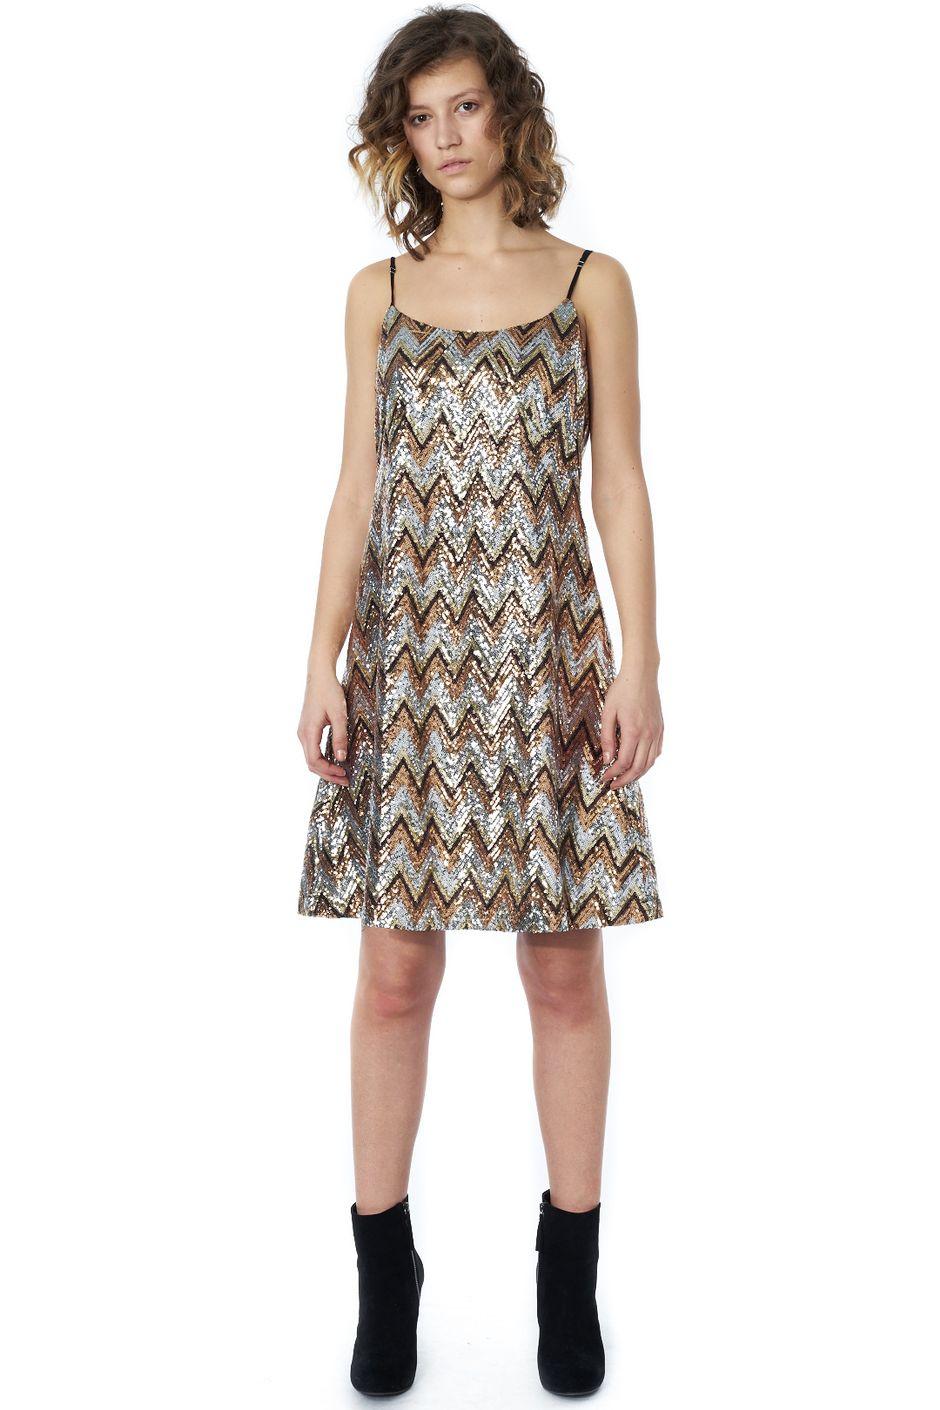 5cc2398ec63 New Years Eve Sequin Dresses - Photo Dress Wallpaper HD AOrg